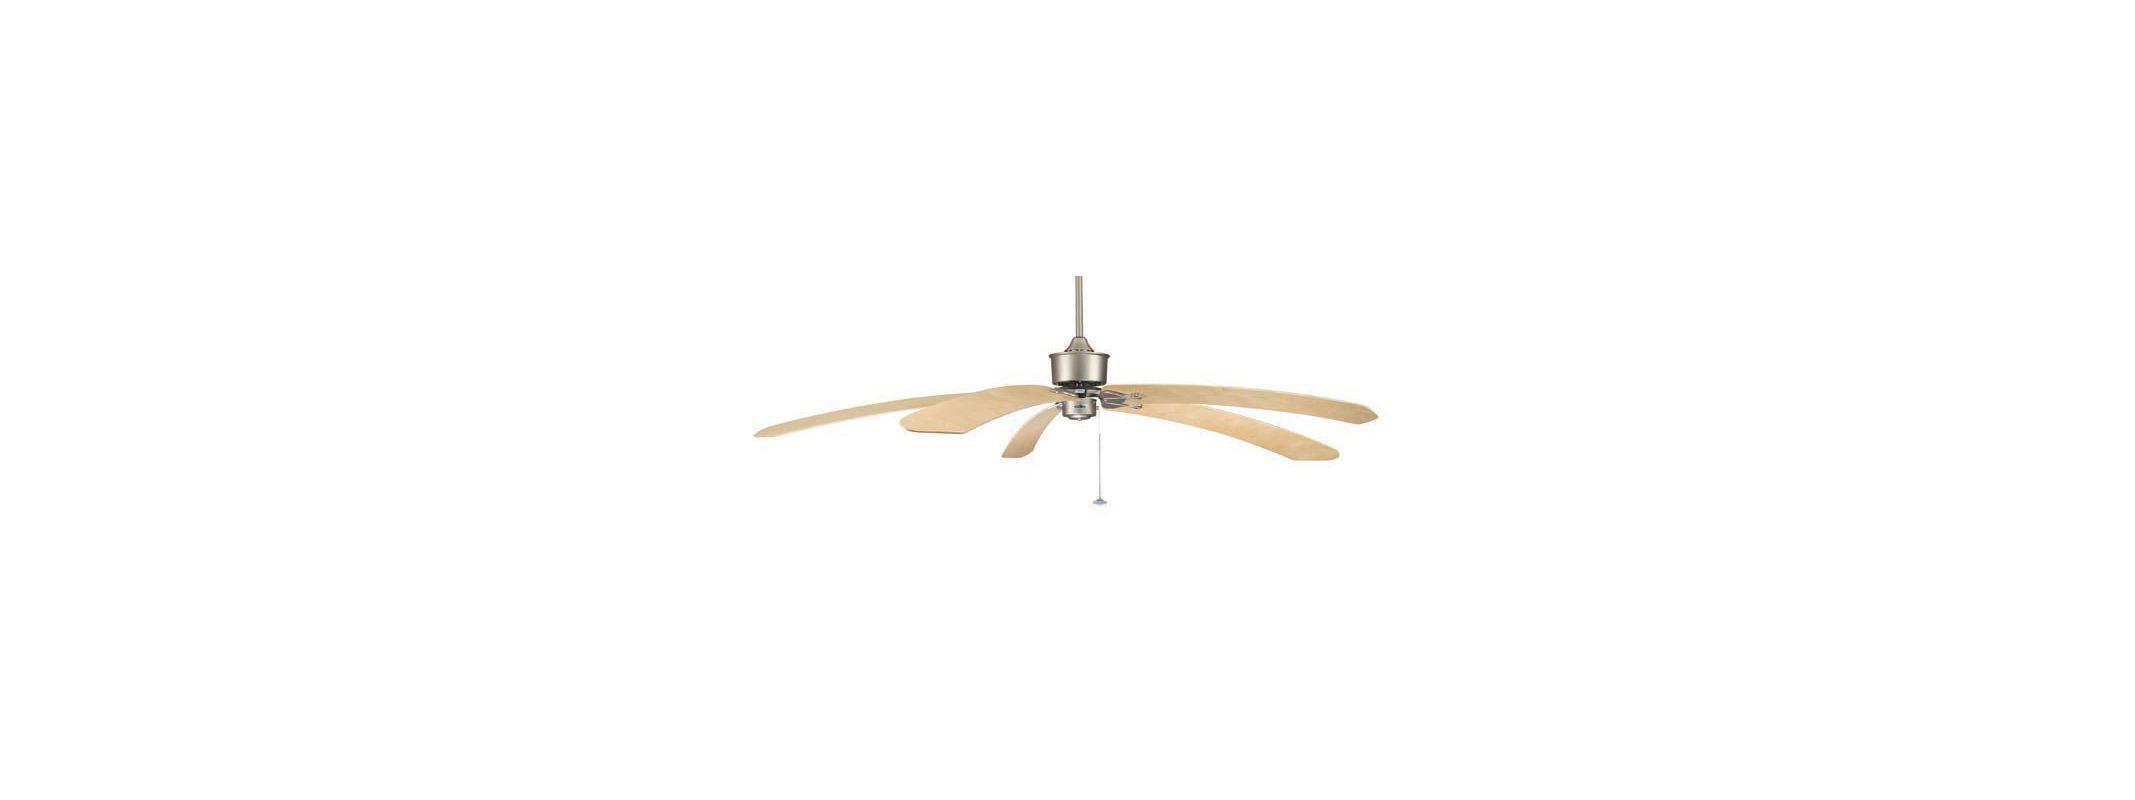 "Fanimation FP320SN1 44"" 5 Blade FanSync Compatible Ceiling Fan - Sale $334.95 ITEM: bci2368142 ID#:FP320SN1 UPC: 840506042124 :"